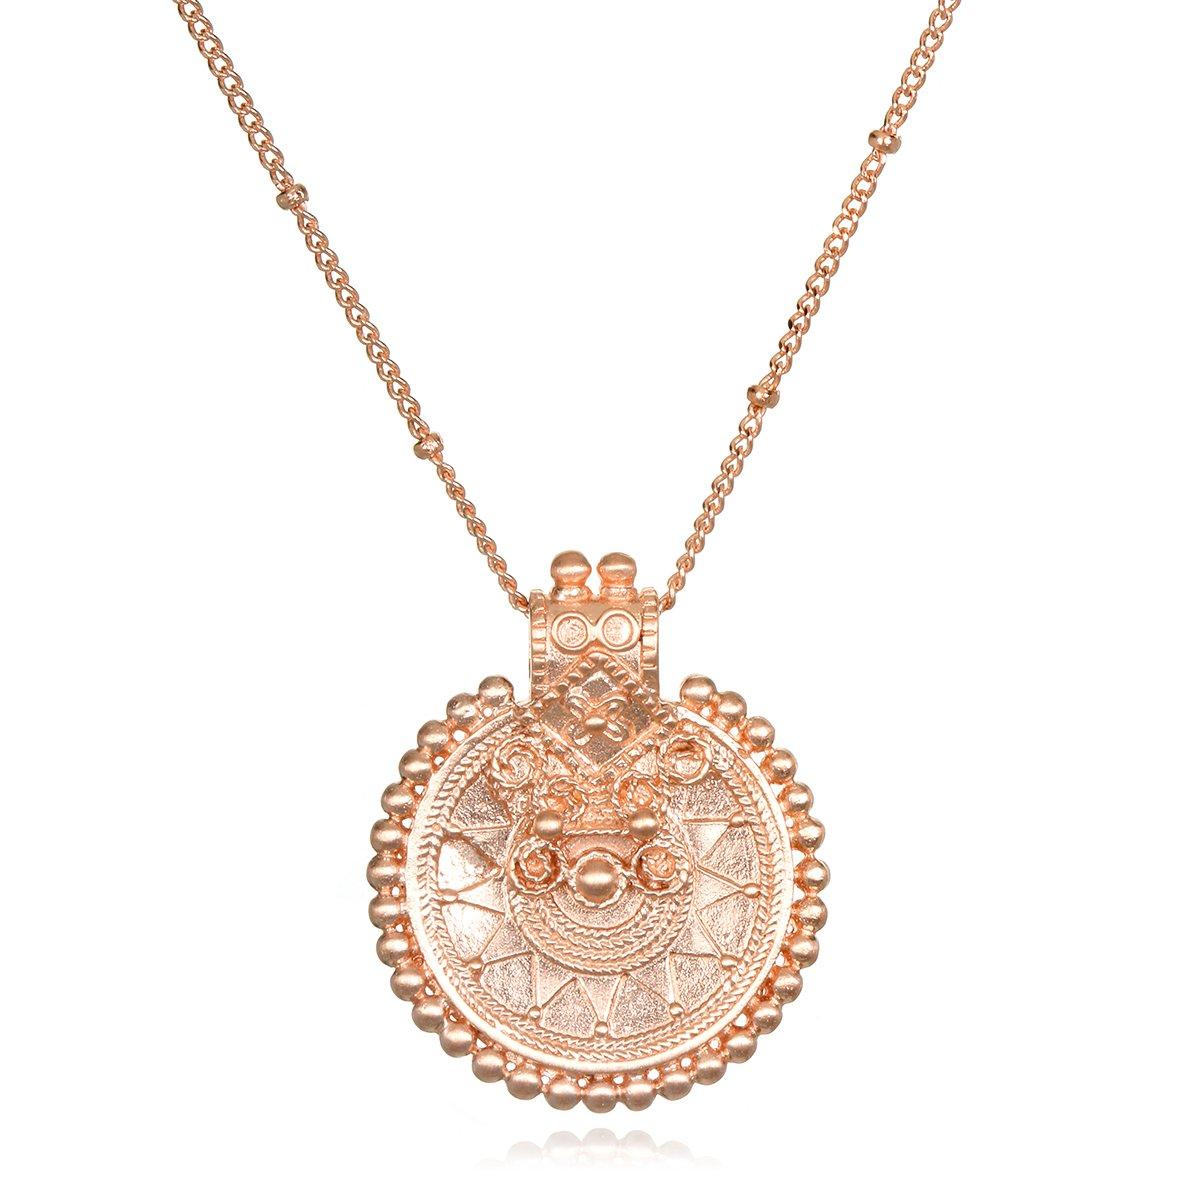 Satya Jewelry Womens Rose Gold Mandala Pendant Necklace 36-Inch, One Size NRG3-L36